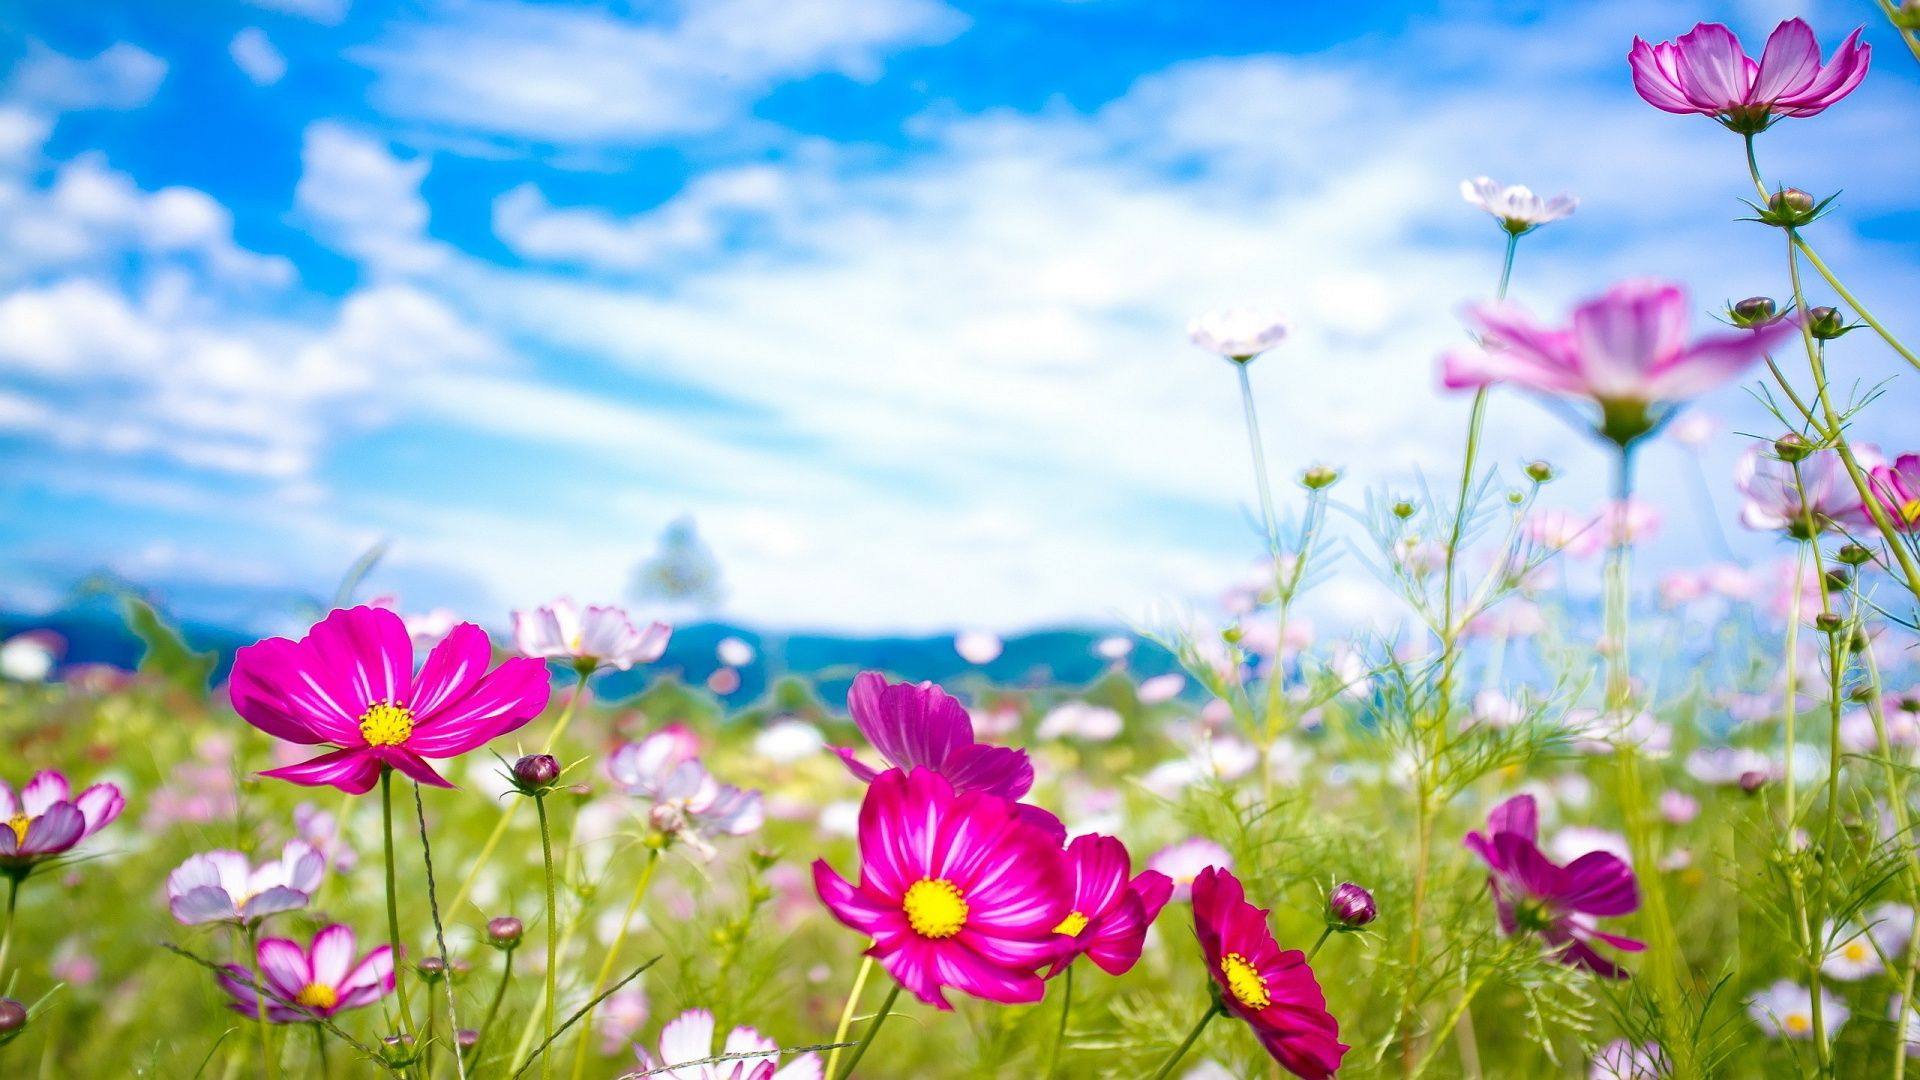 Summer flowers picture 1g 19201080 in full bloom flower mightylinksfo